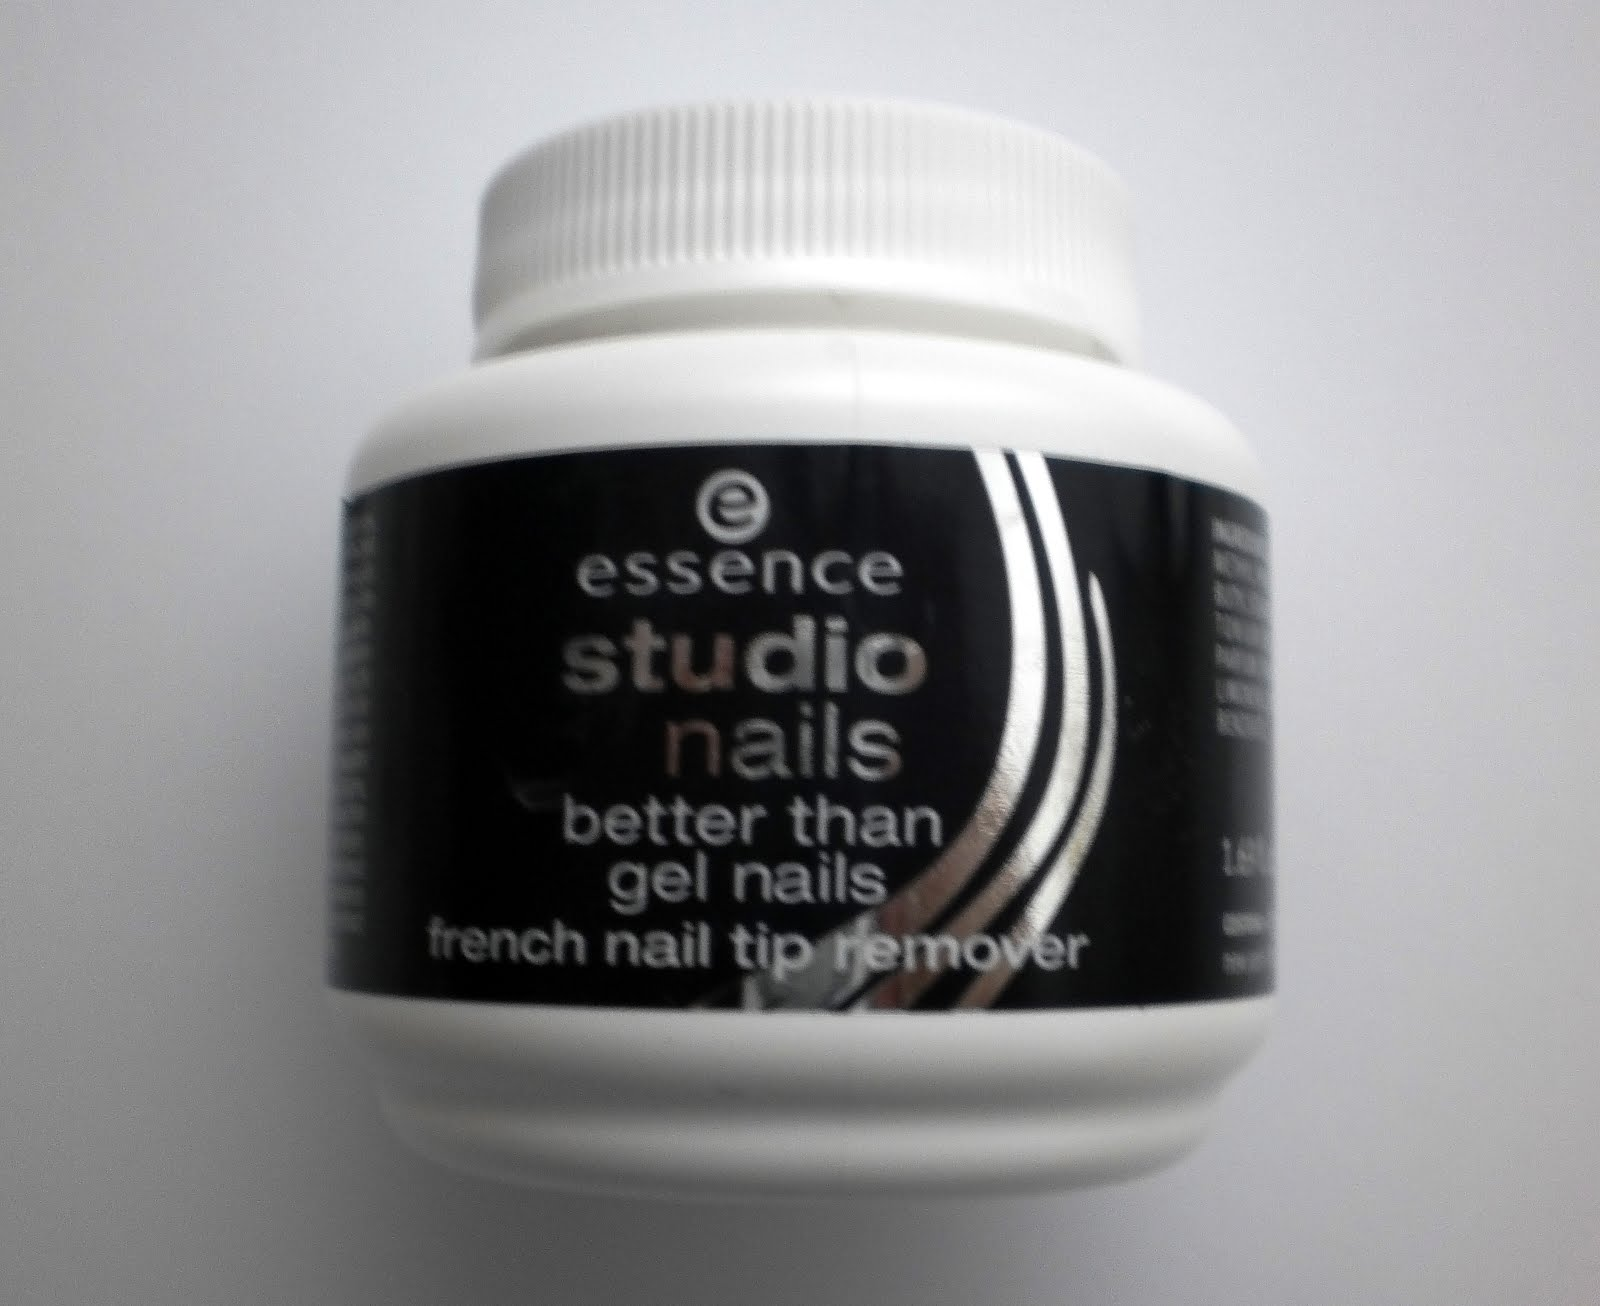 Klainer Blog: Quick-Tipp: essence studio nails better than gel nails ...